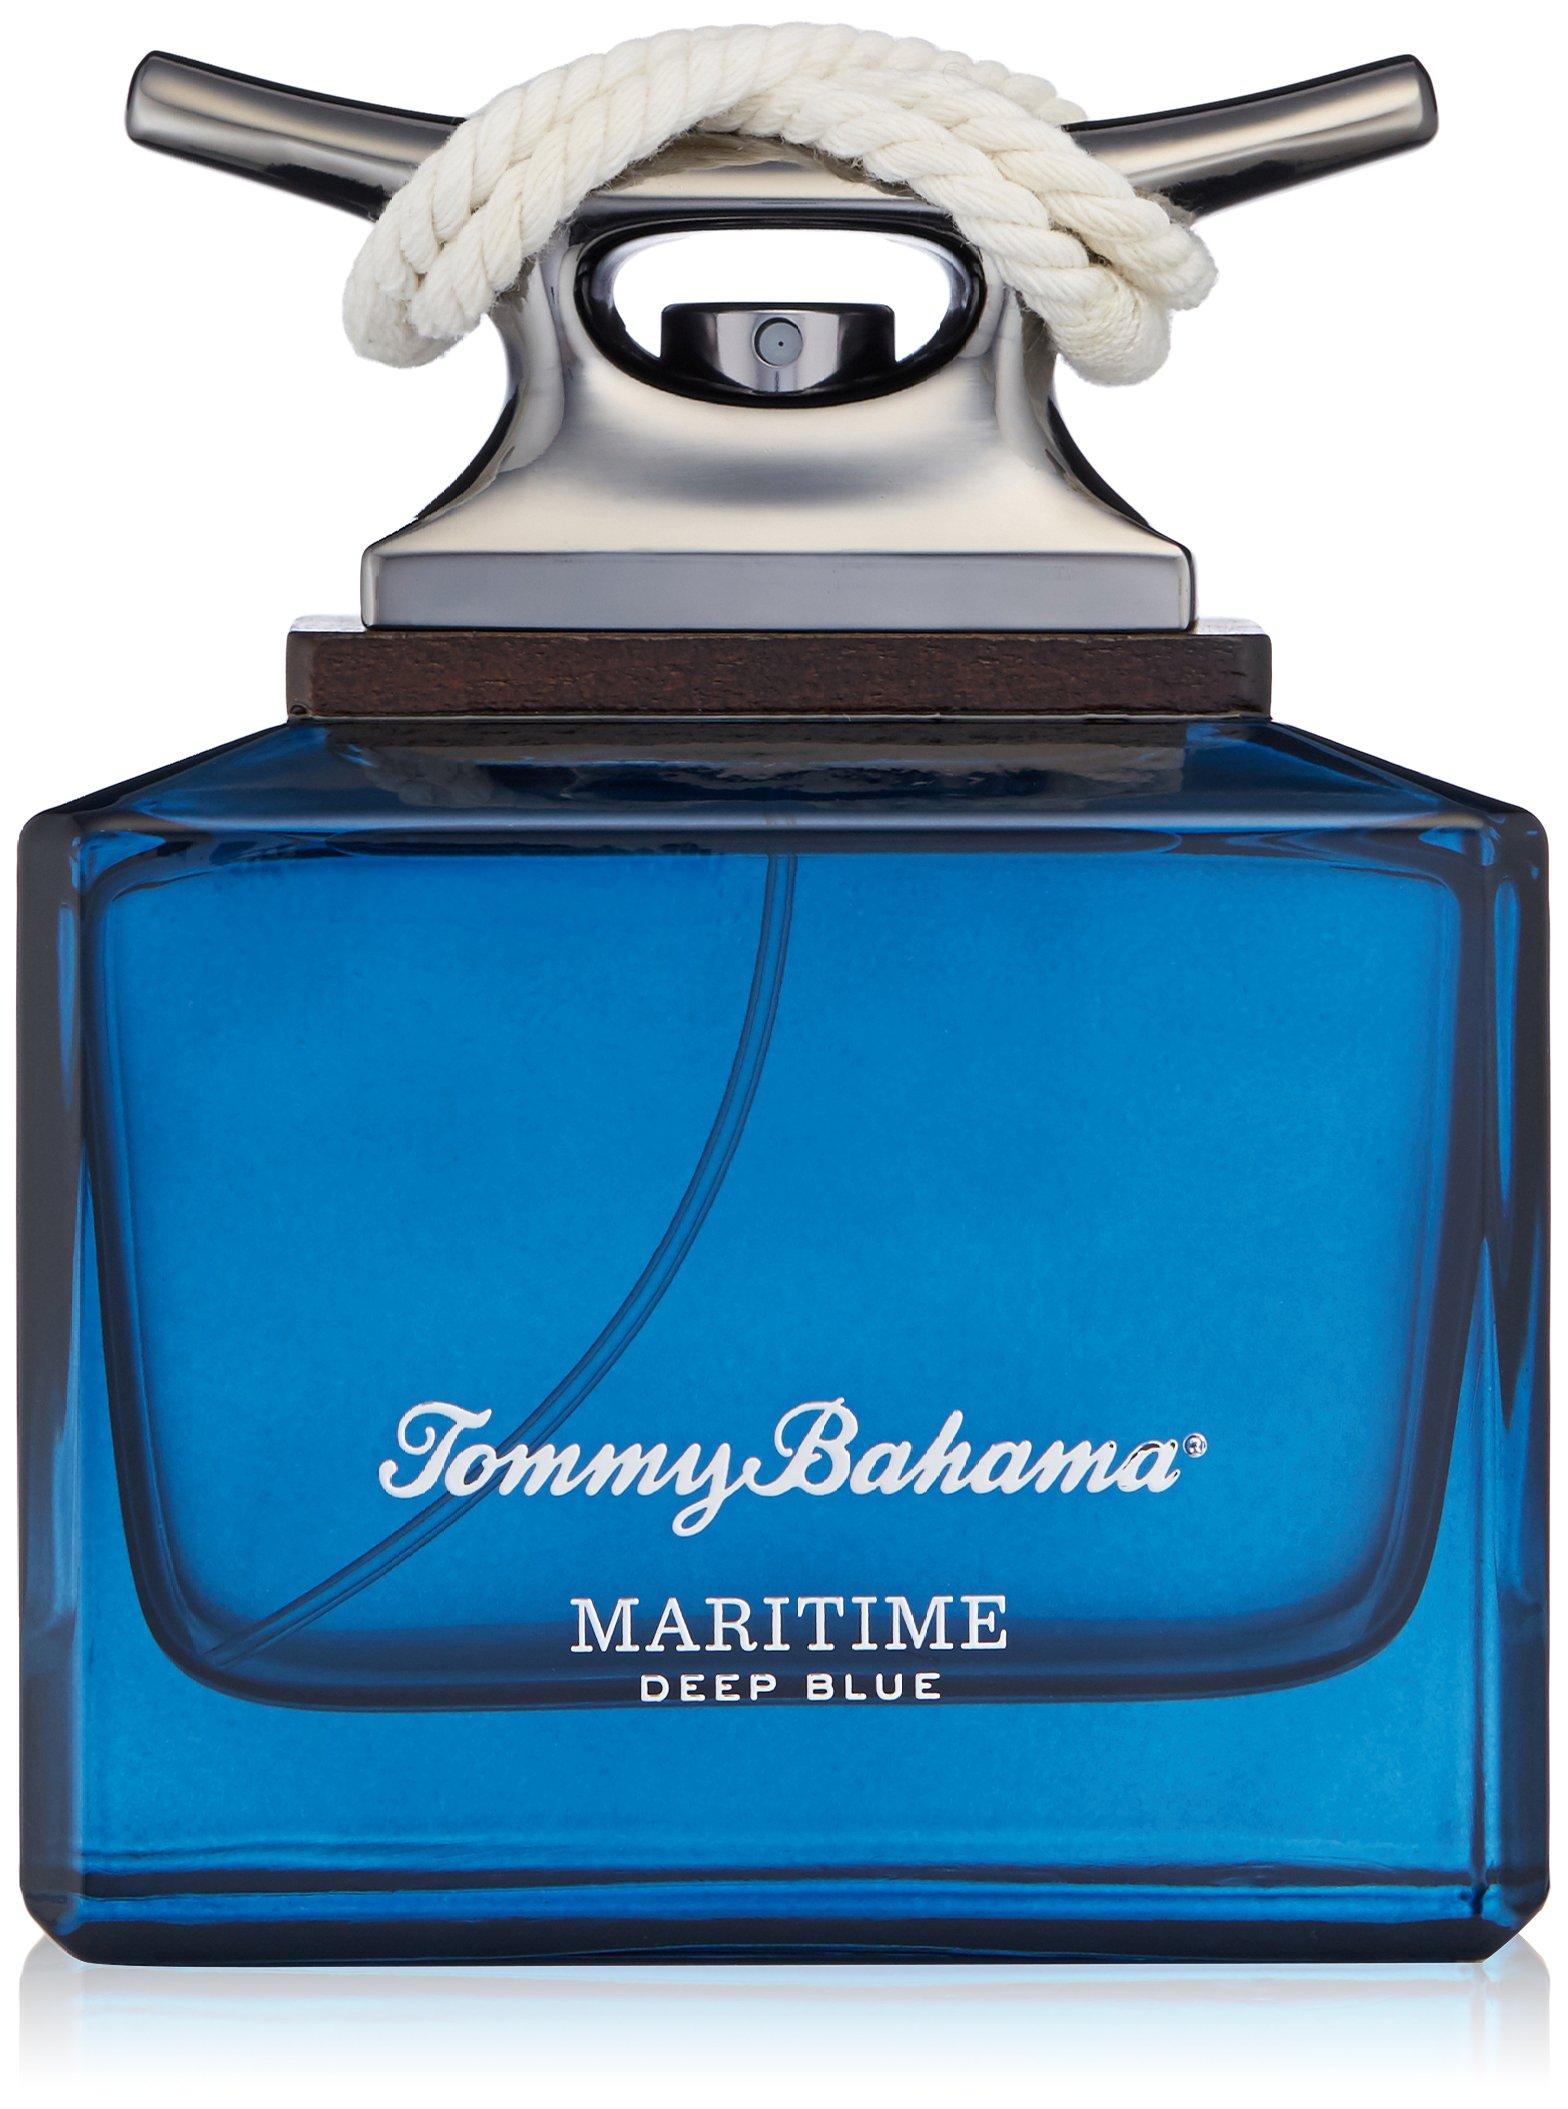 Tommy Bahama Maritime Deep Blue Cologne, 4.2 oz.